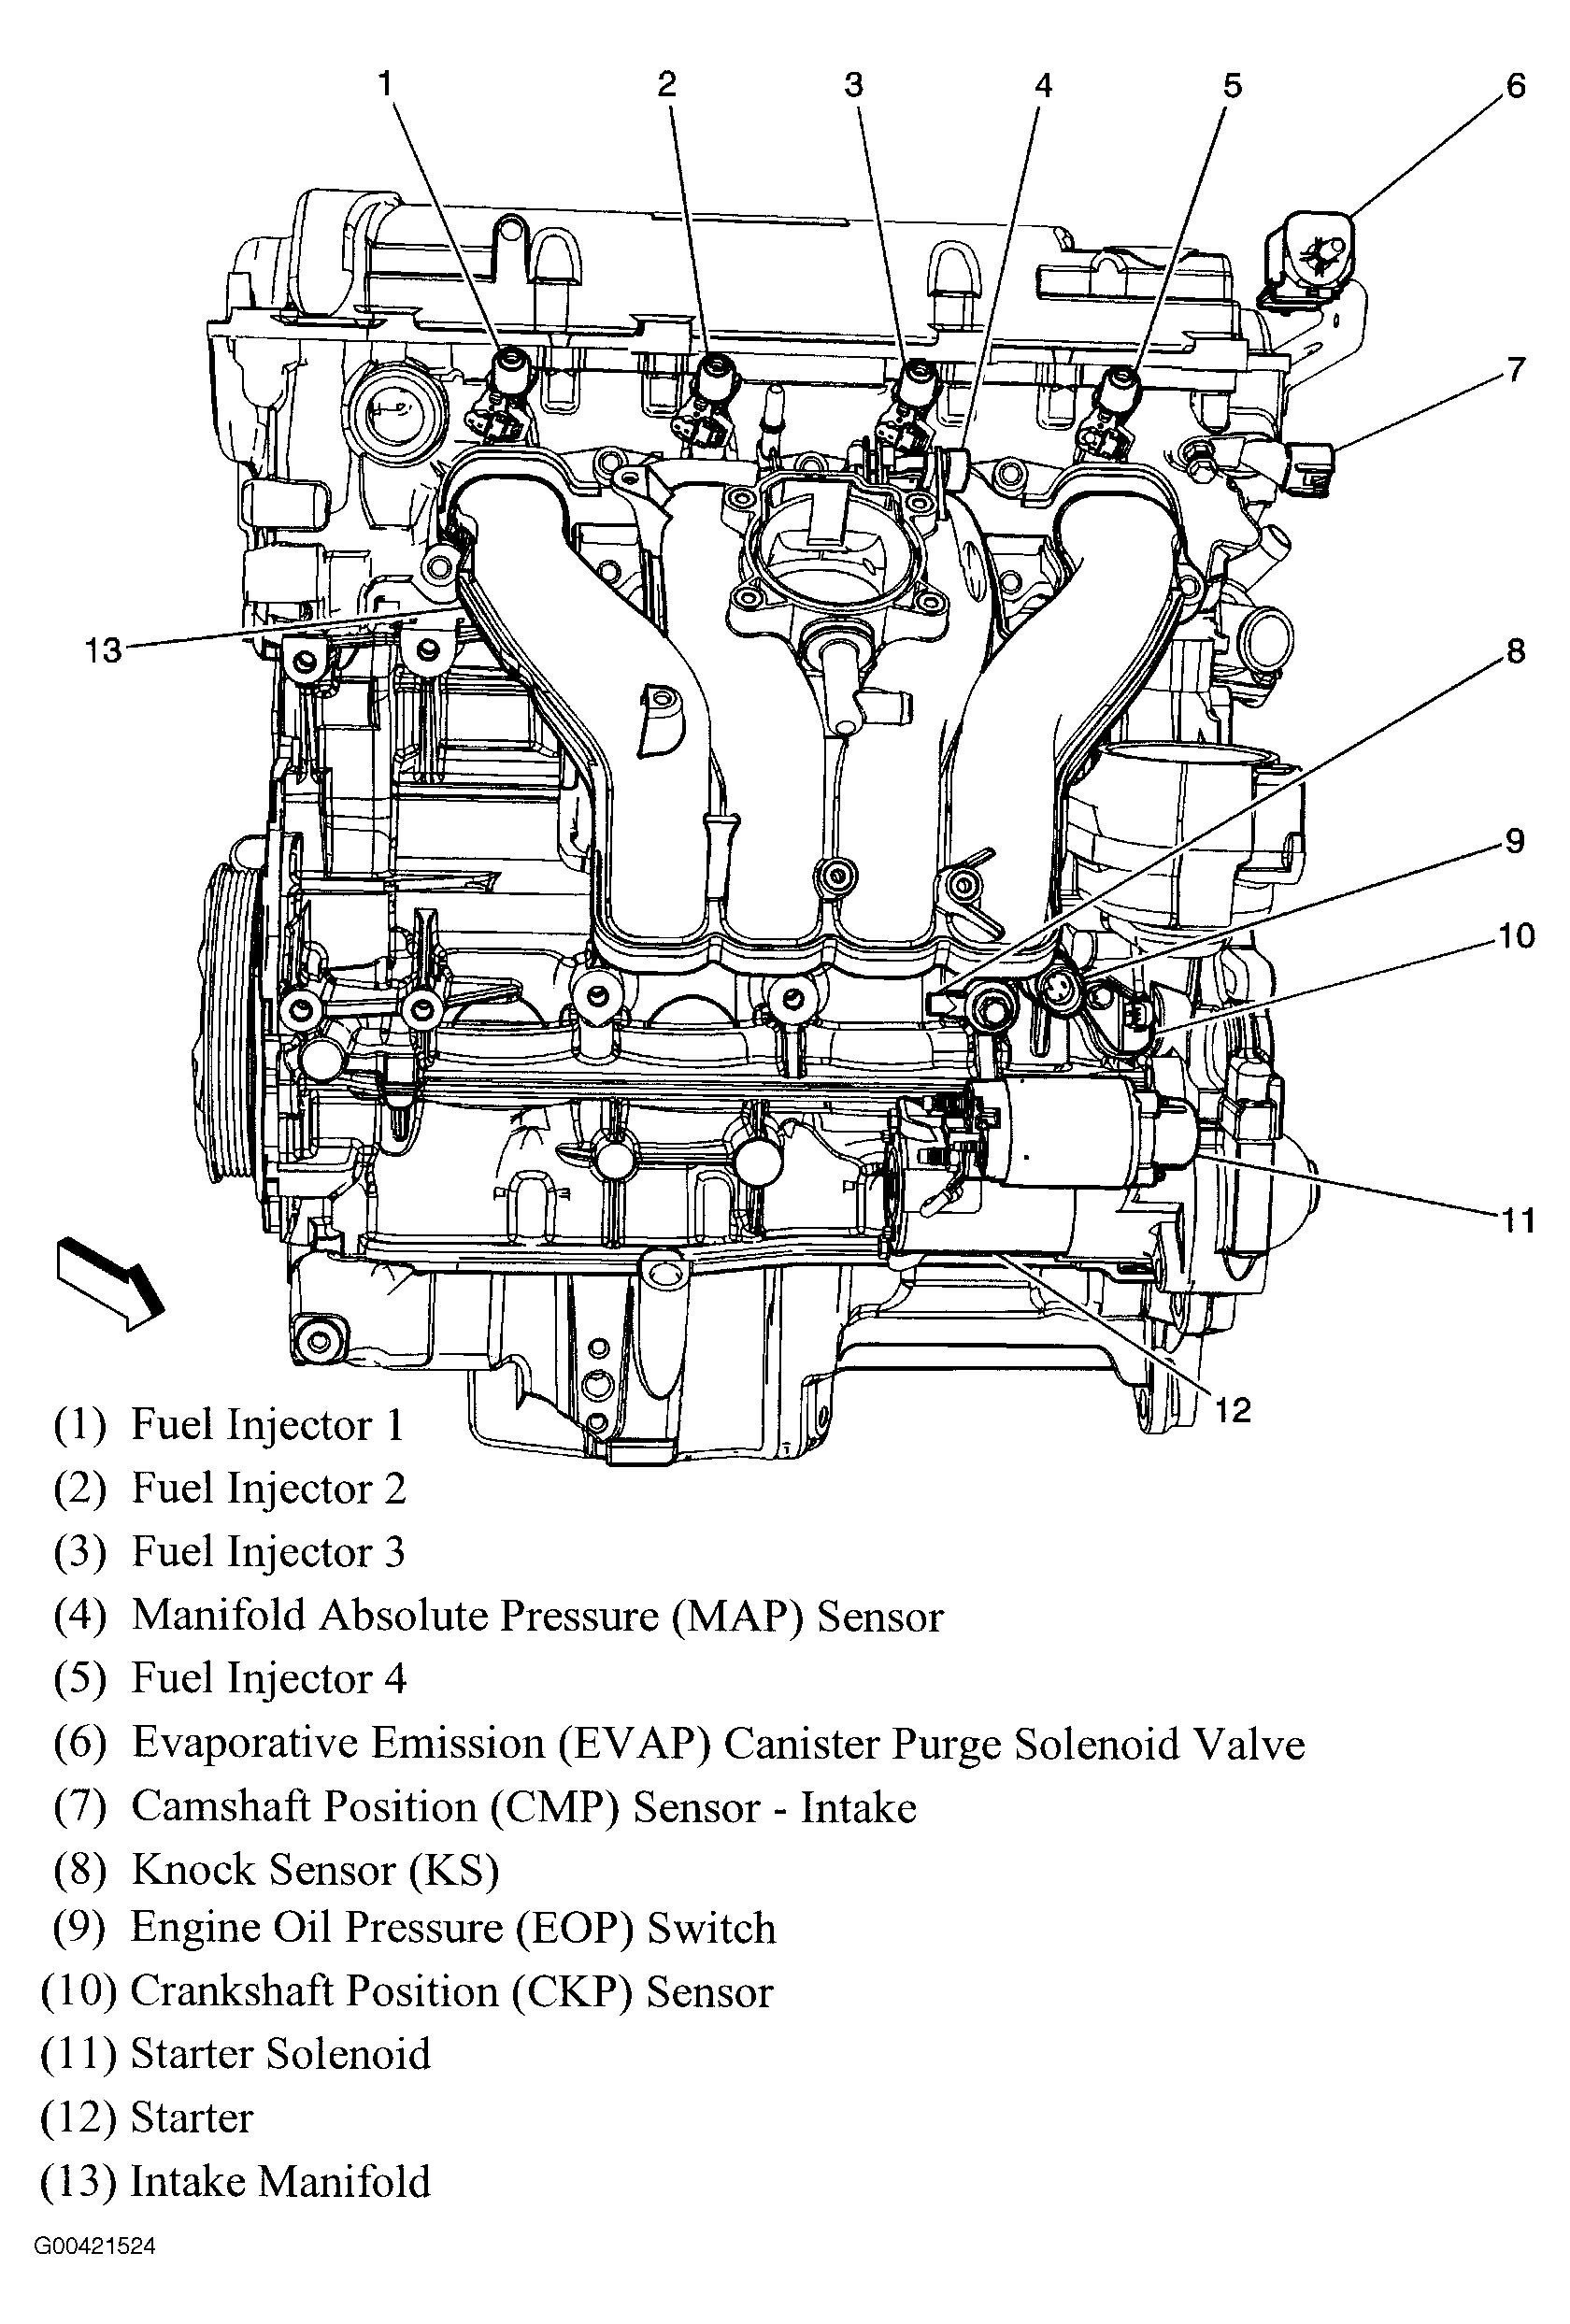 2002 Chevy Cavalier Engine Diagram Pontiac 2 4 Engine Diagram Intake Manifold Wiring Diagram Dash Of 2002 Chevy Cavalier Engine Diagram